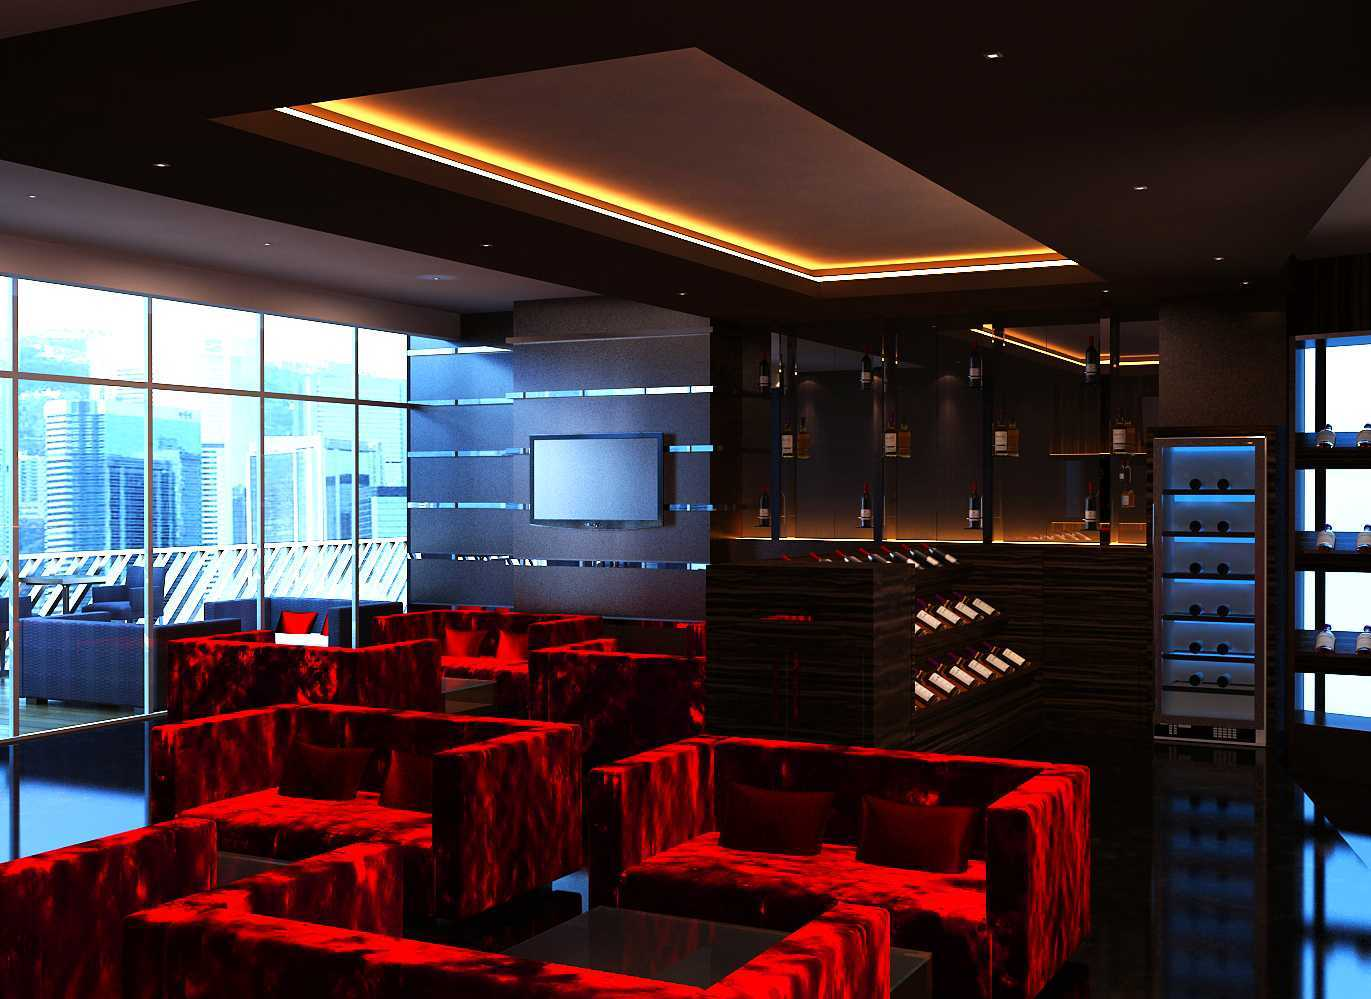 Donny Steven Massie The Wine Lounge Sudirman - Jakarta Sudirman - Jakarta Seating Area Modern 23469